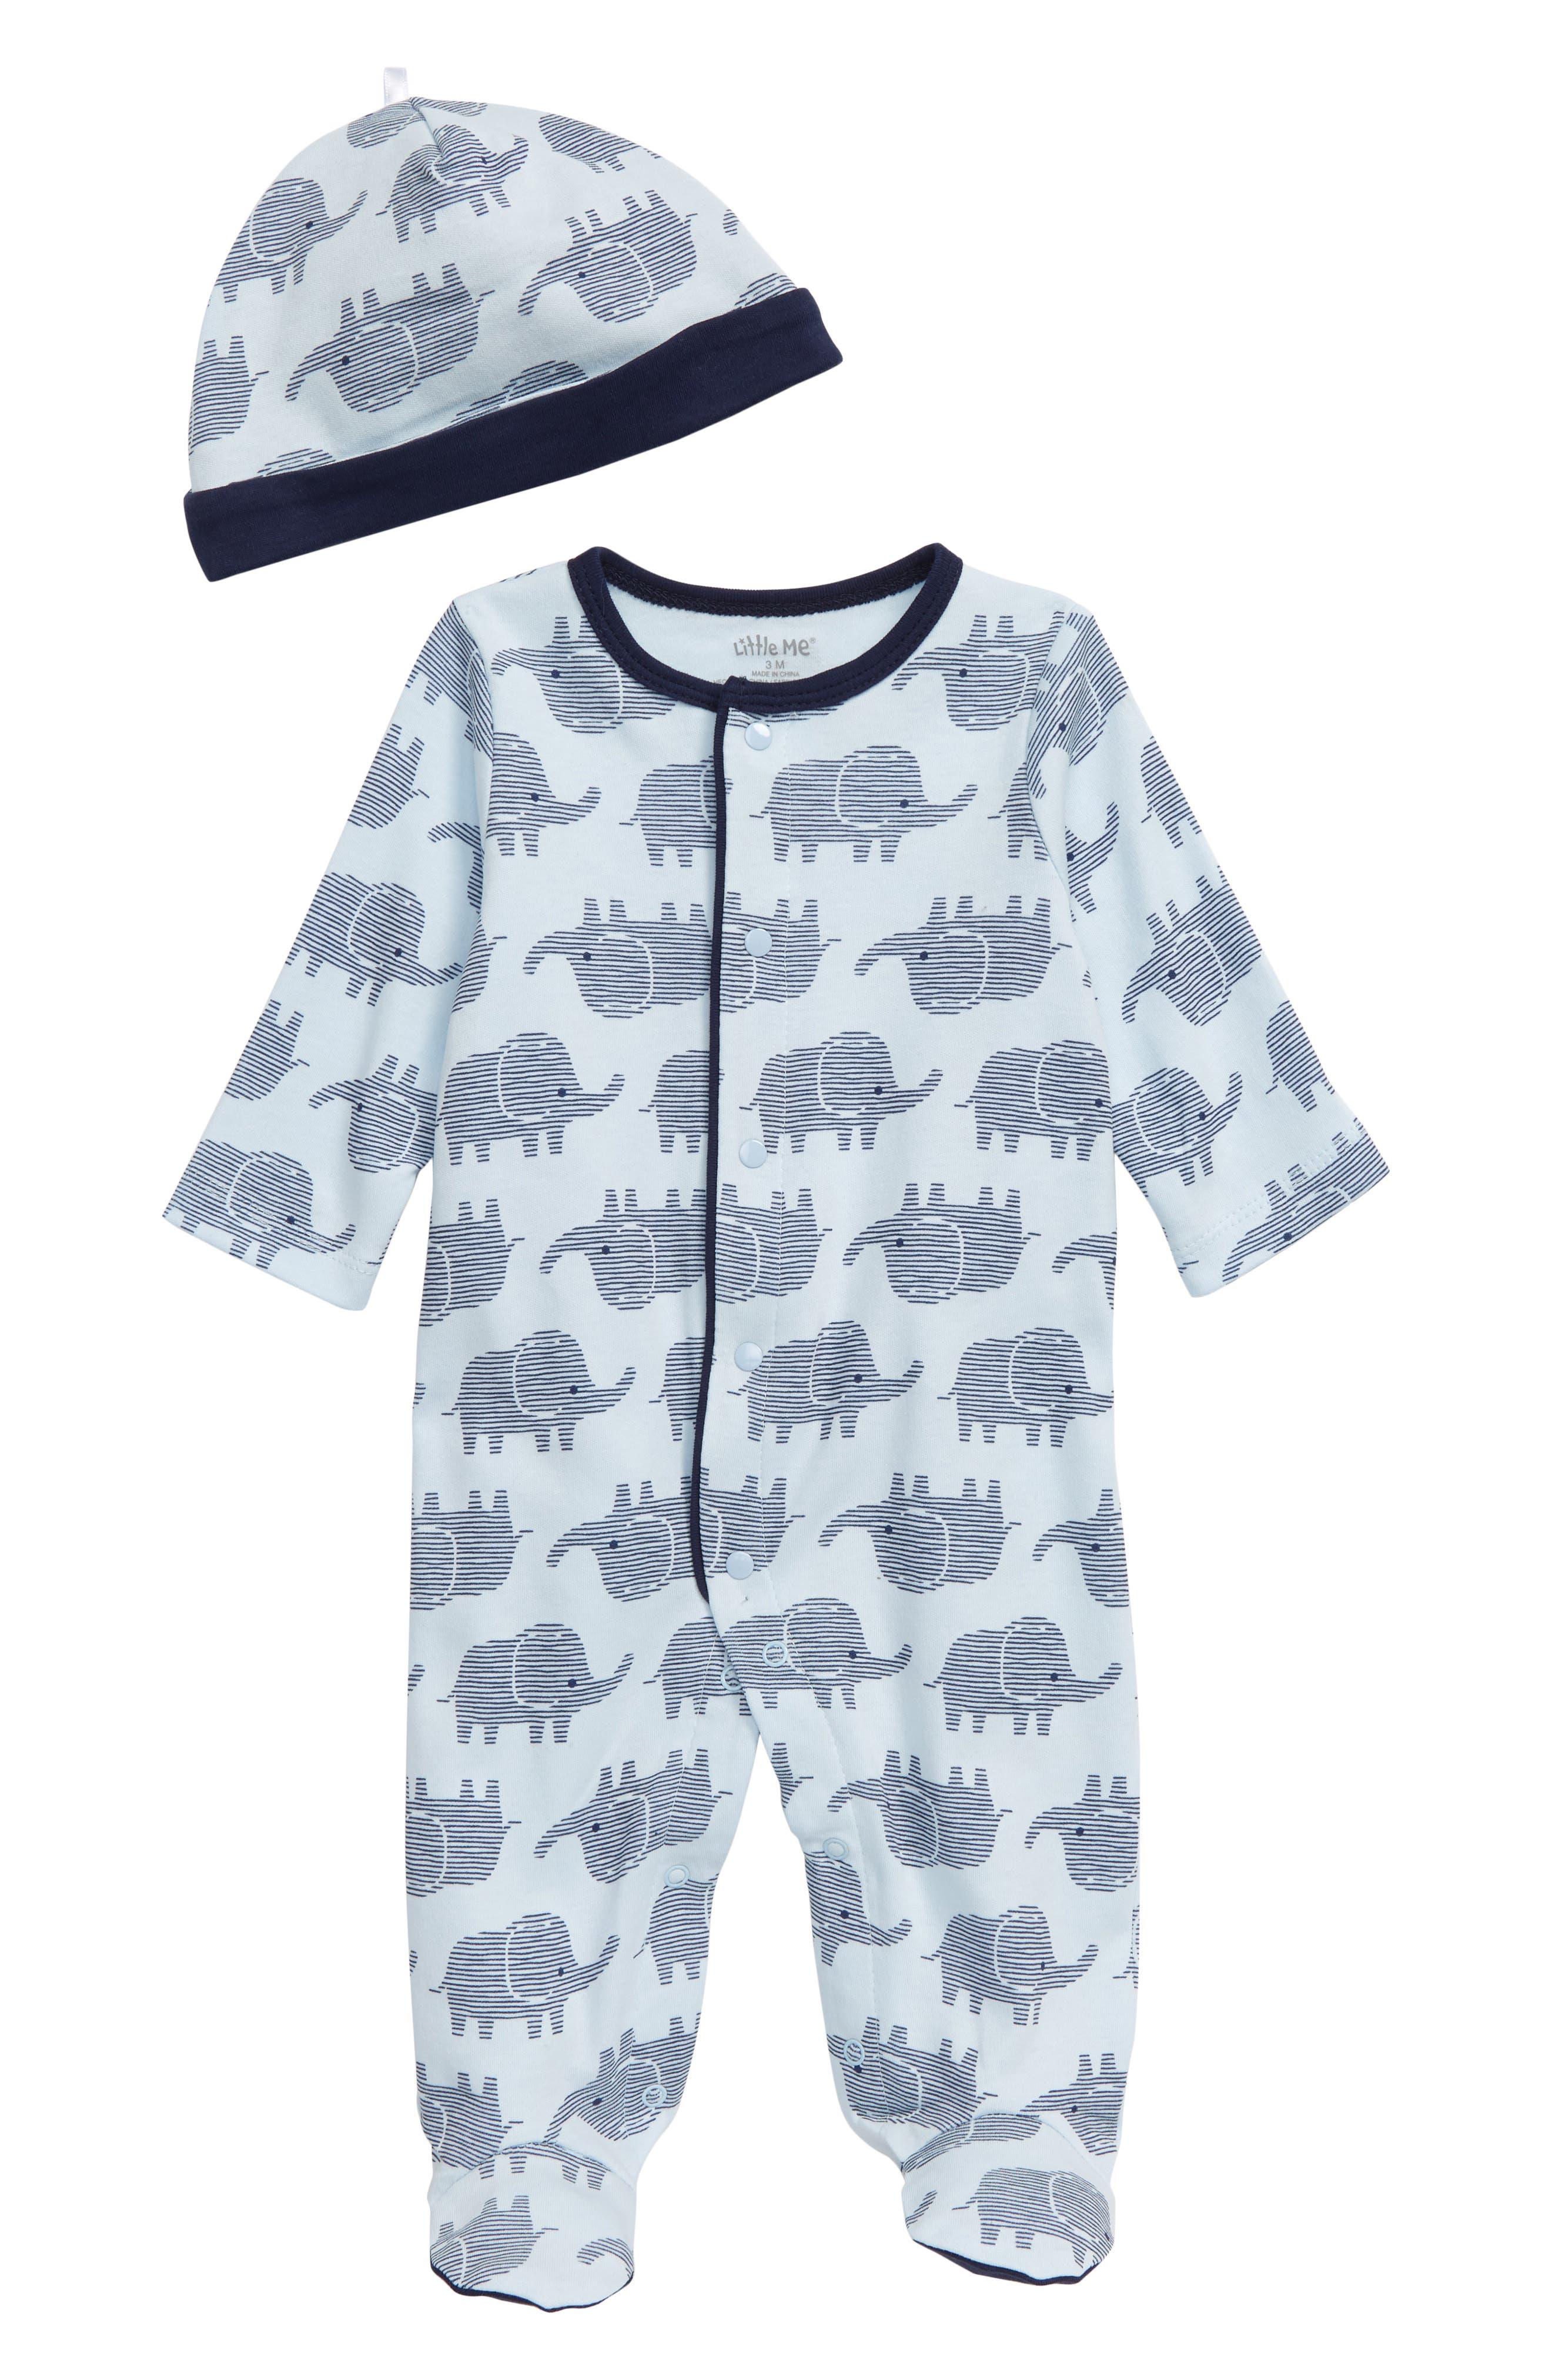 Burt/'s Bees Baby Boy Short Sleeve Coverall ~ Blue White /& Beige Camo~ Organic ~